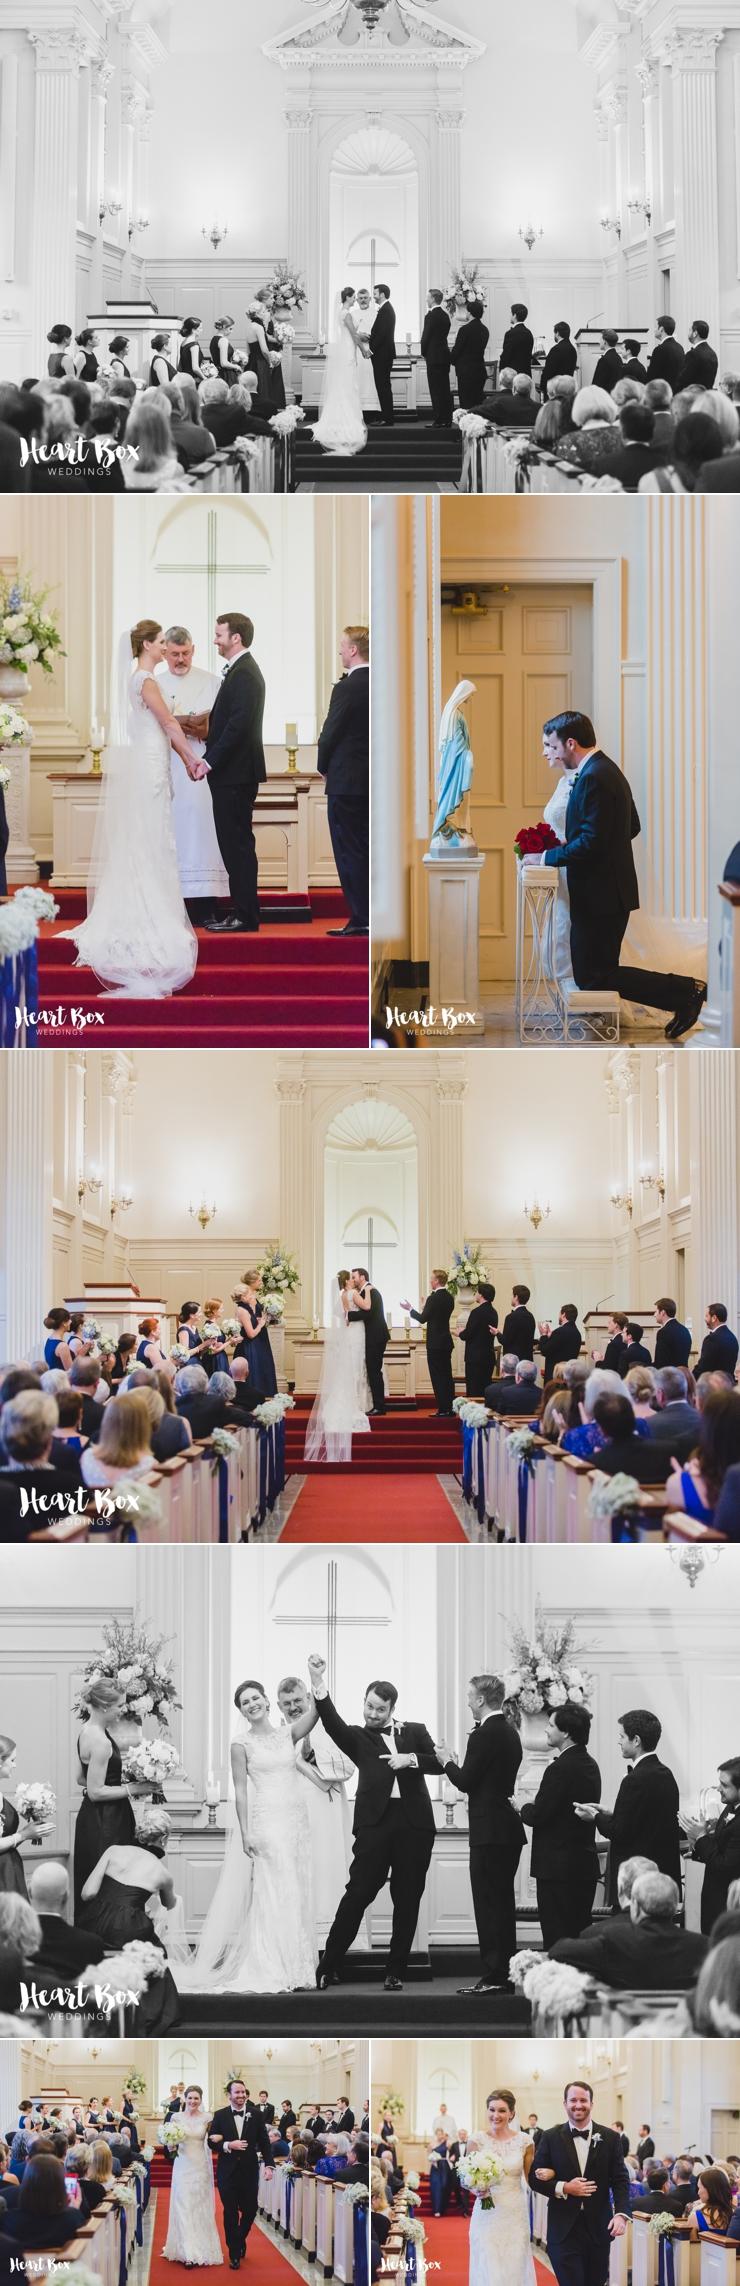 Anthony Wedding Blog Collages 14.jpg